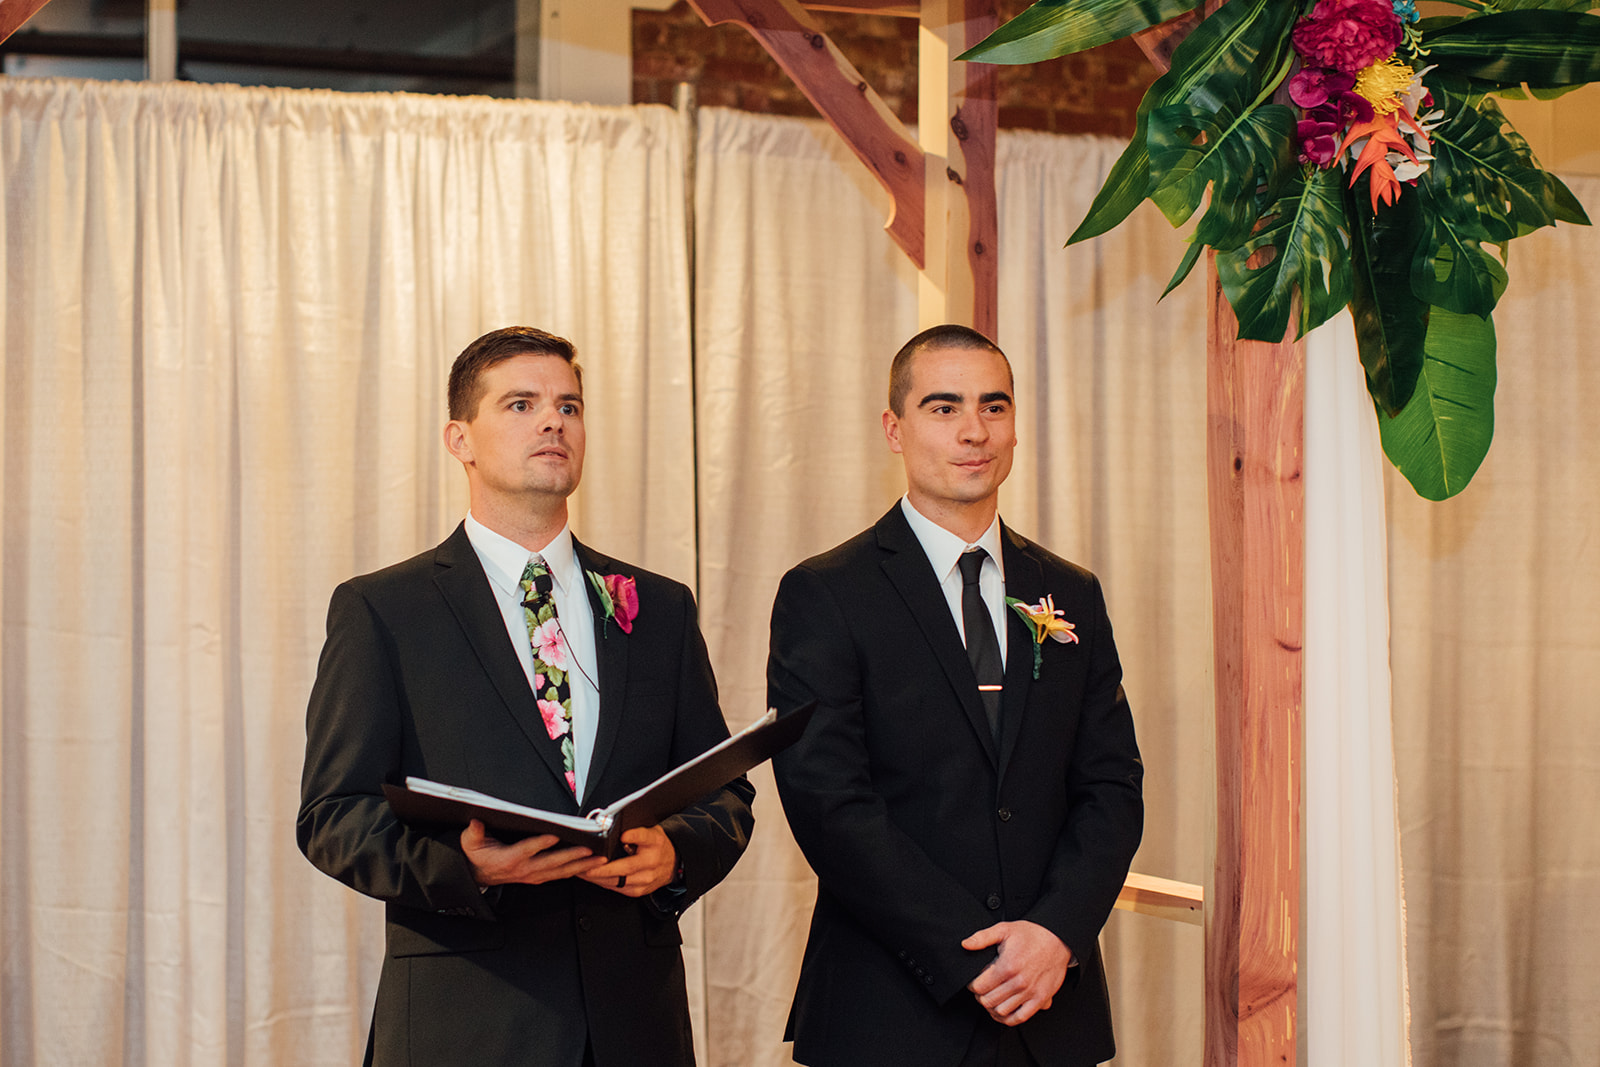 ceremony0C0A6819.jpg